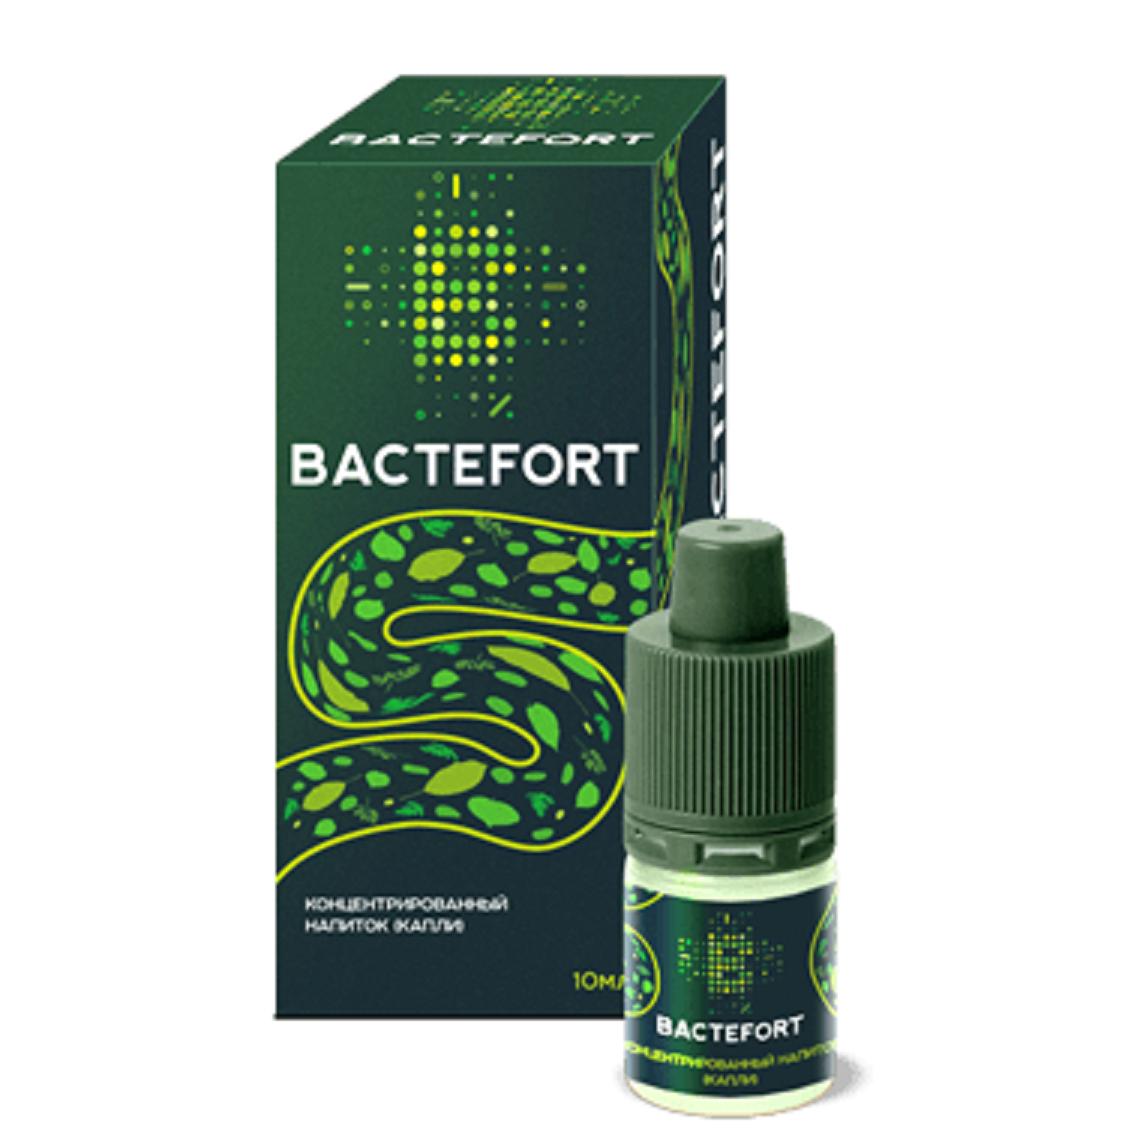 bactefort форум